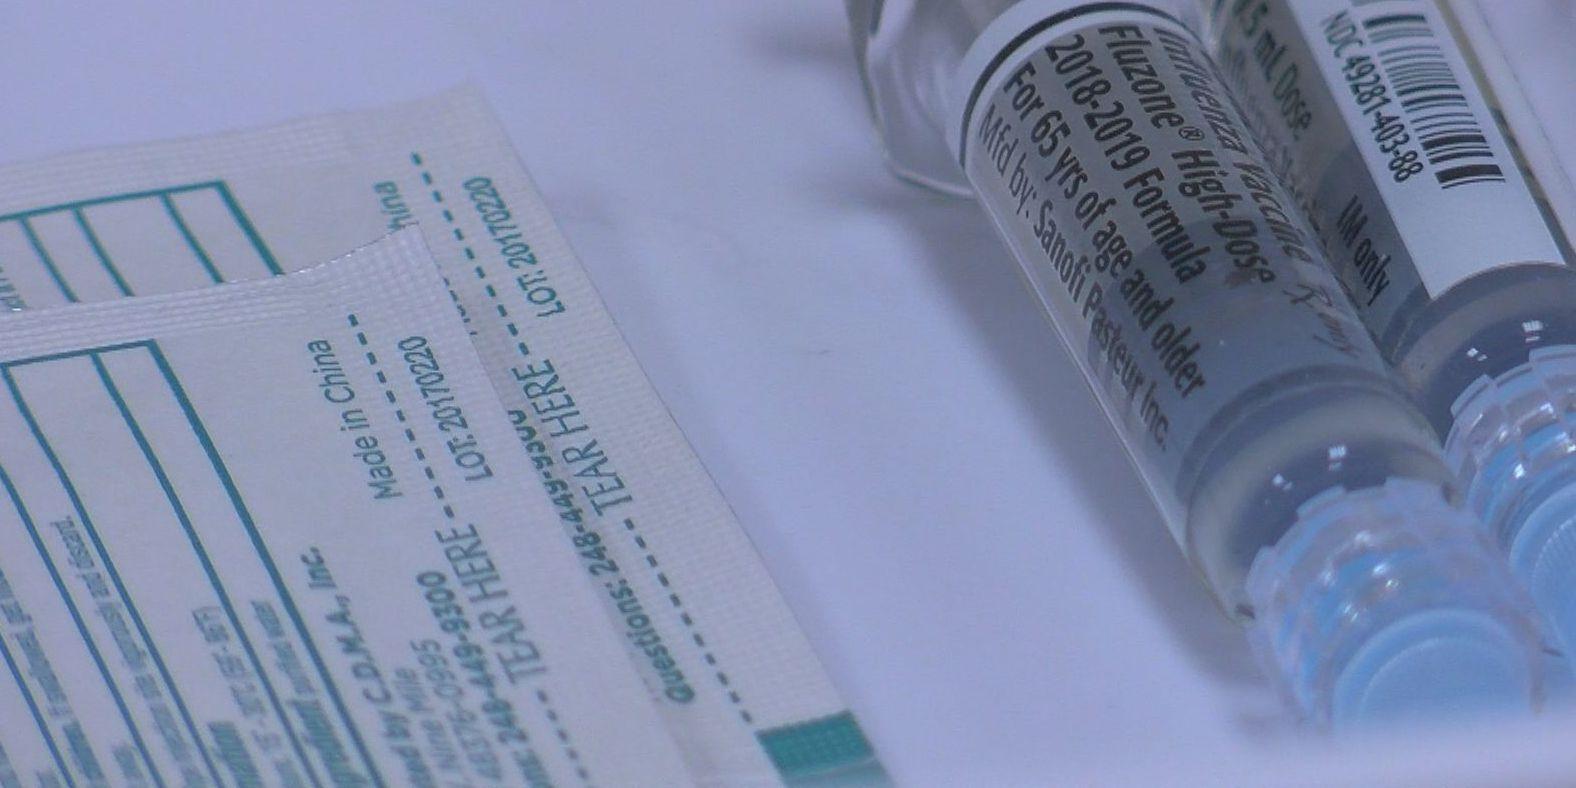 Health officials urge people to get vaccinated ahead of peak flu season